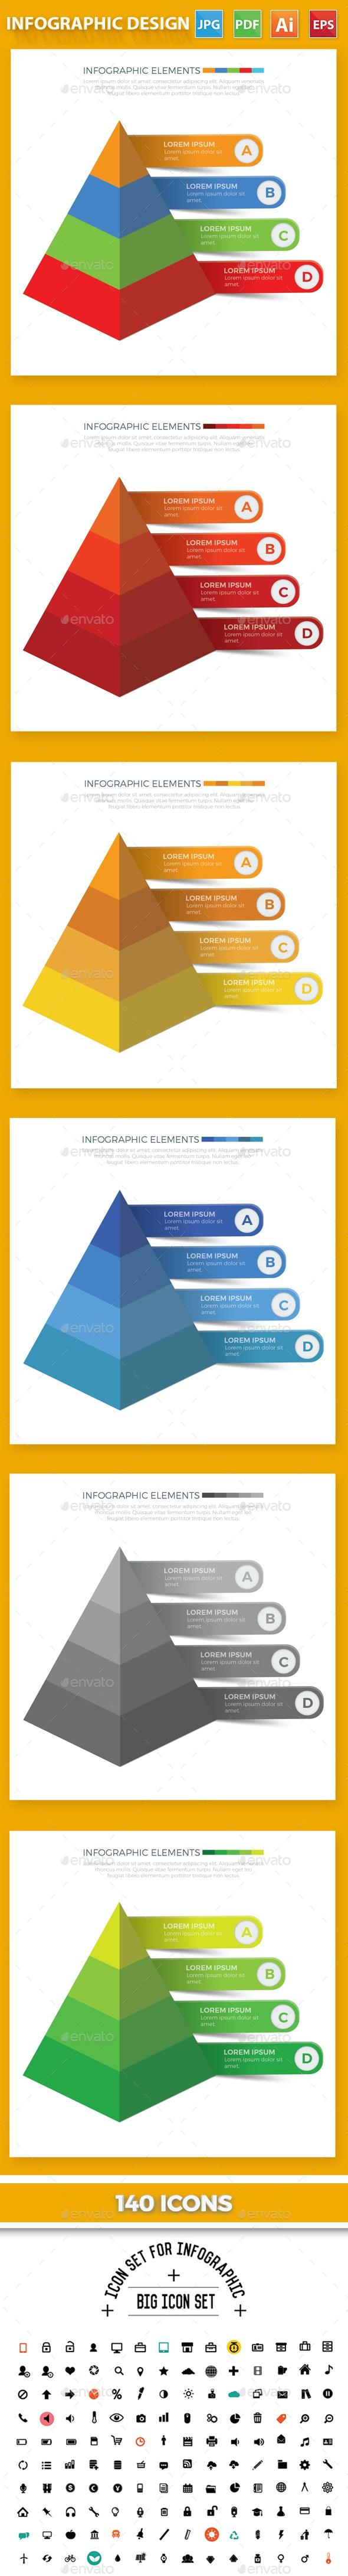 Pyramid Infographic Design - Infographics